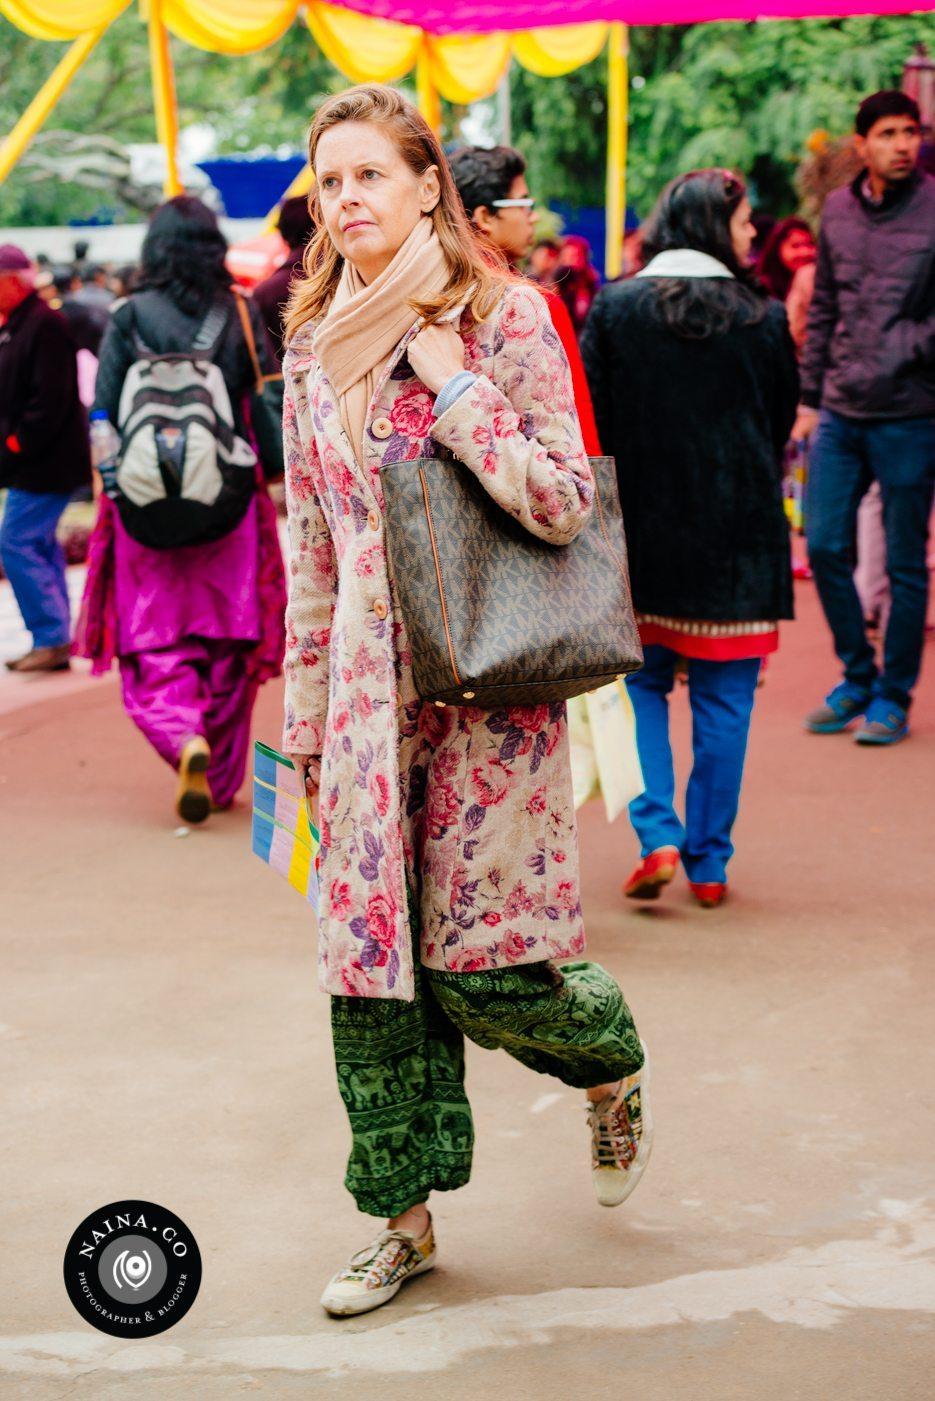 Naina.co-Raconteuse-Visuelle-Photographer-Blogger-Storyteller-Luxury-Lifestyle-January-2015-Jaipur-Literature-Festival-StRegis-LeMeridien-ZeeJLF-EyesForStreetStyle-18